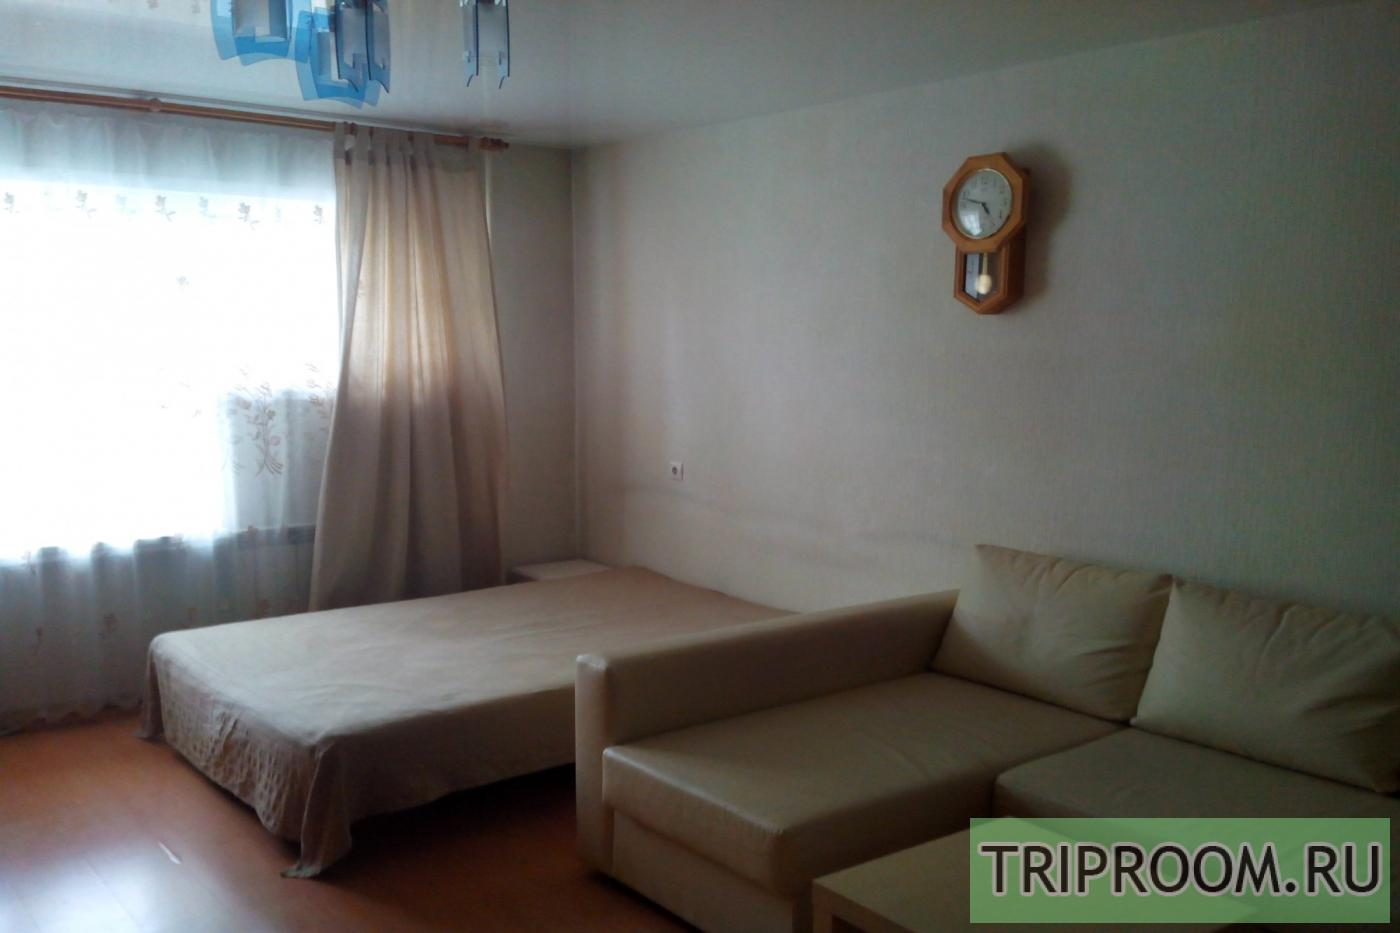 2-комнатная квартира посуточно (вариант № 10044), ул. Ломоносова улица, фото № 16